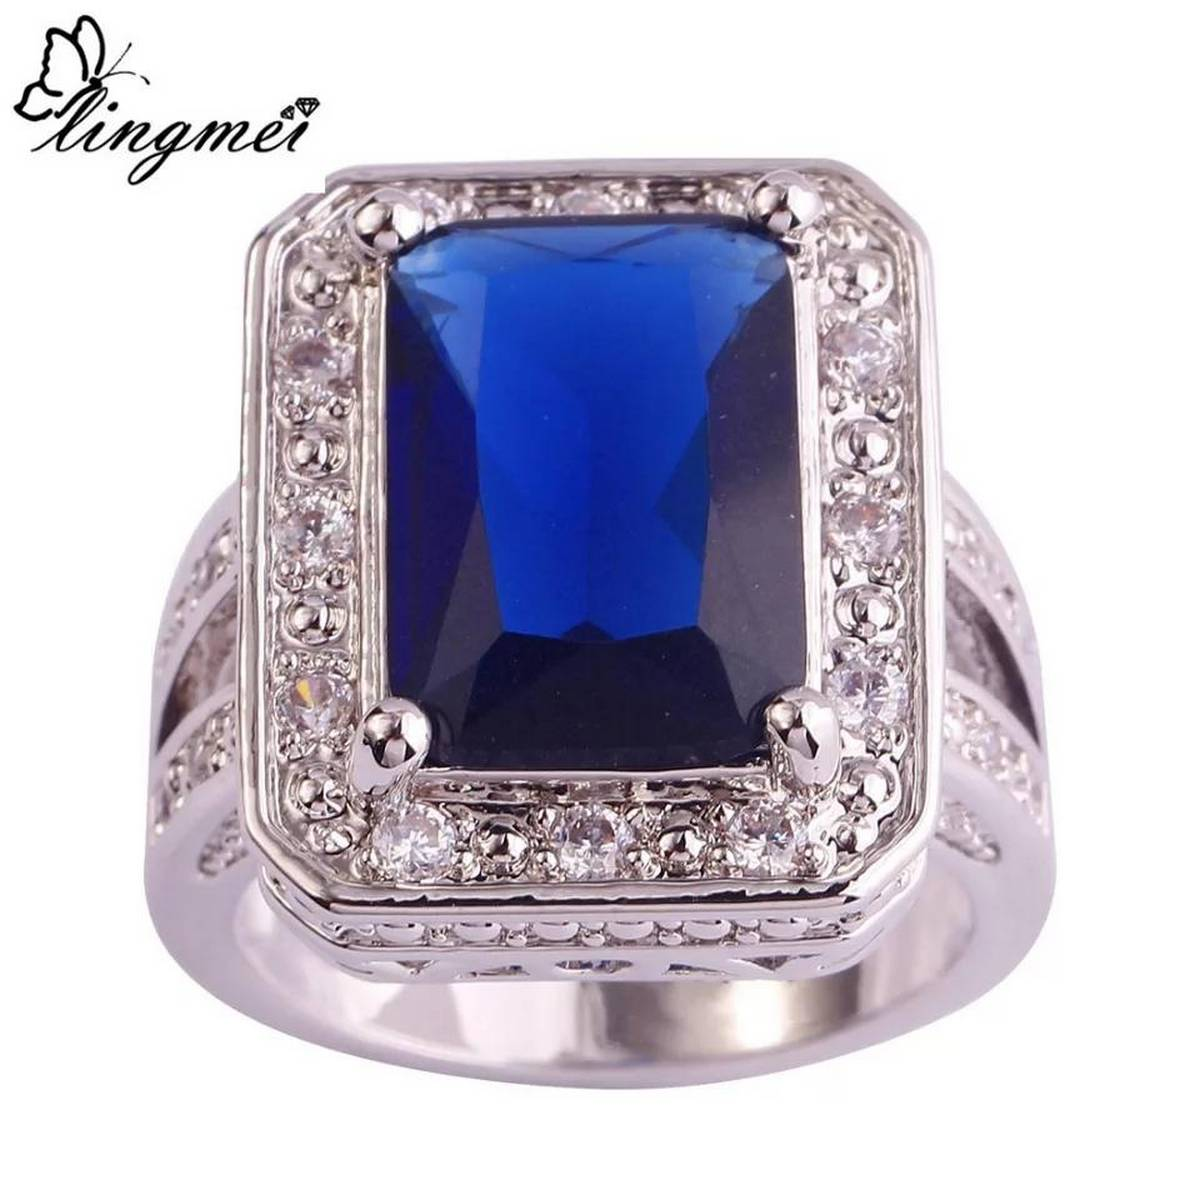 Diamond Engagement Wedding Ring for Ladies